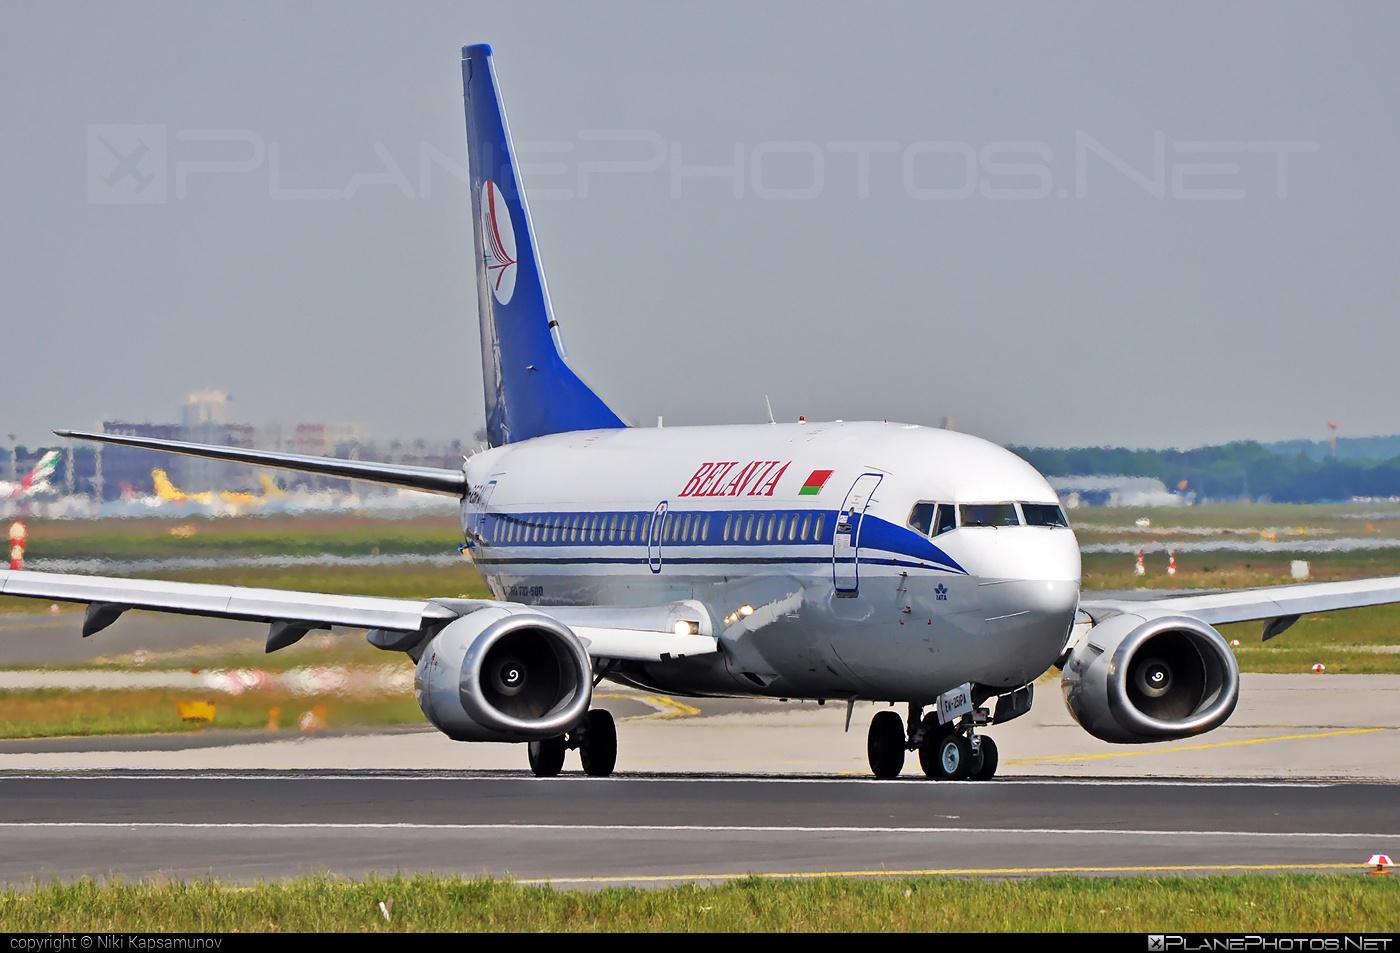 Boeing 737-500 - EW-251PA operated by Belavia Belarusian Airlines #b737 #belavia #boeing #boeing737